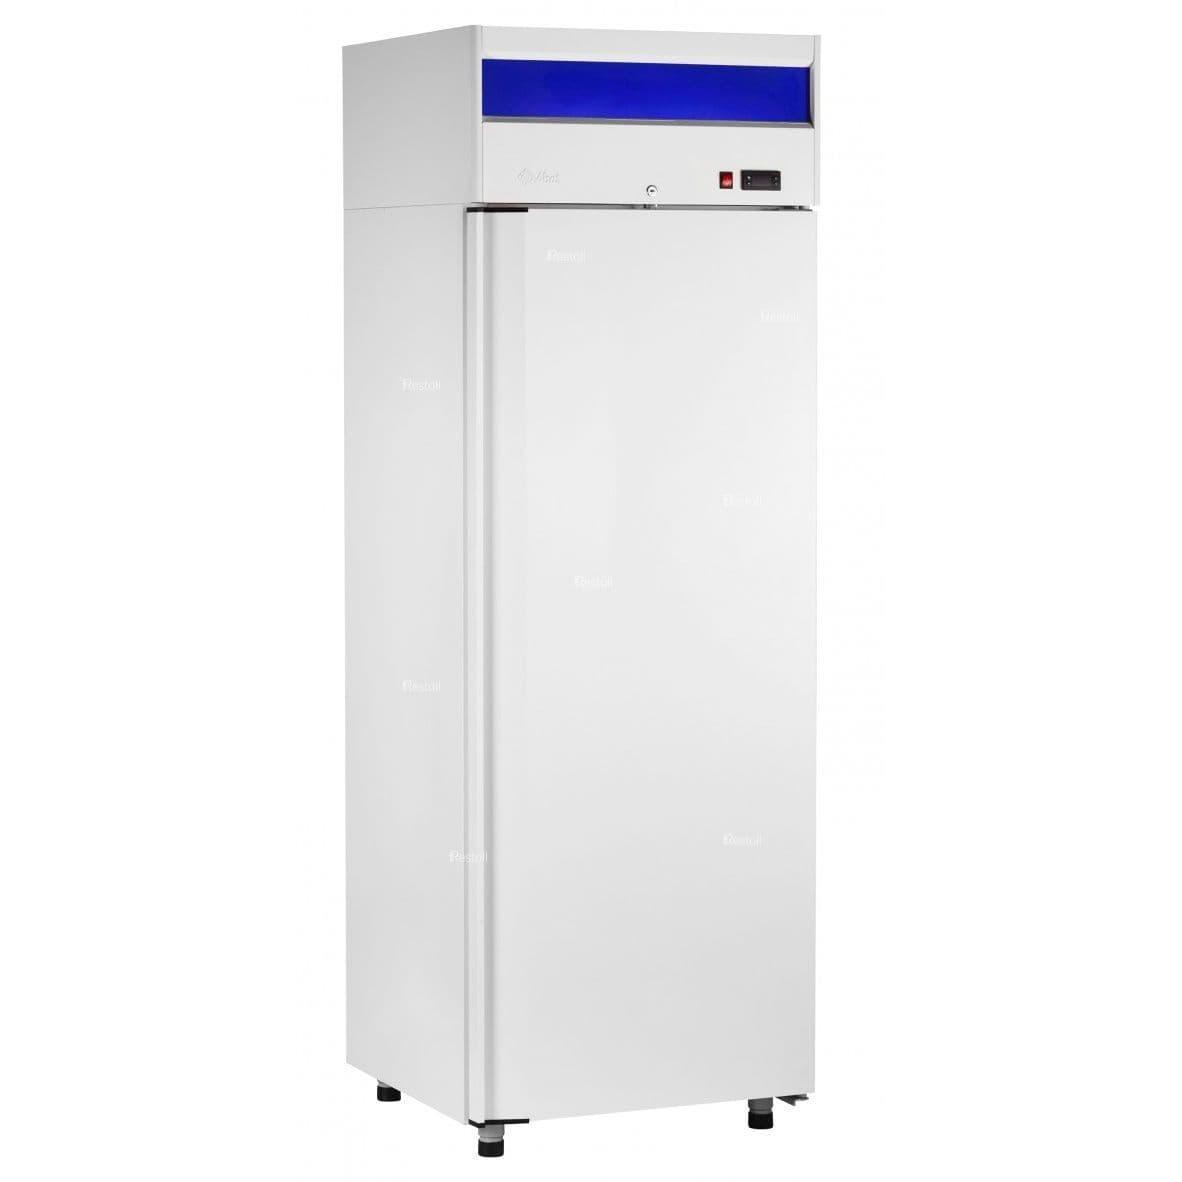 Шкаф морозильный Abat ШХн-0,7 оцинкованный